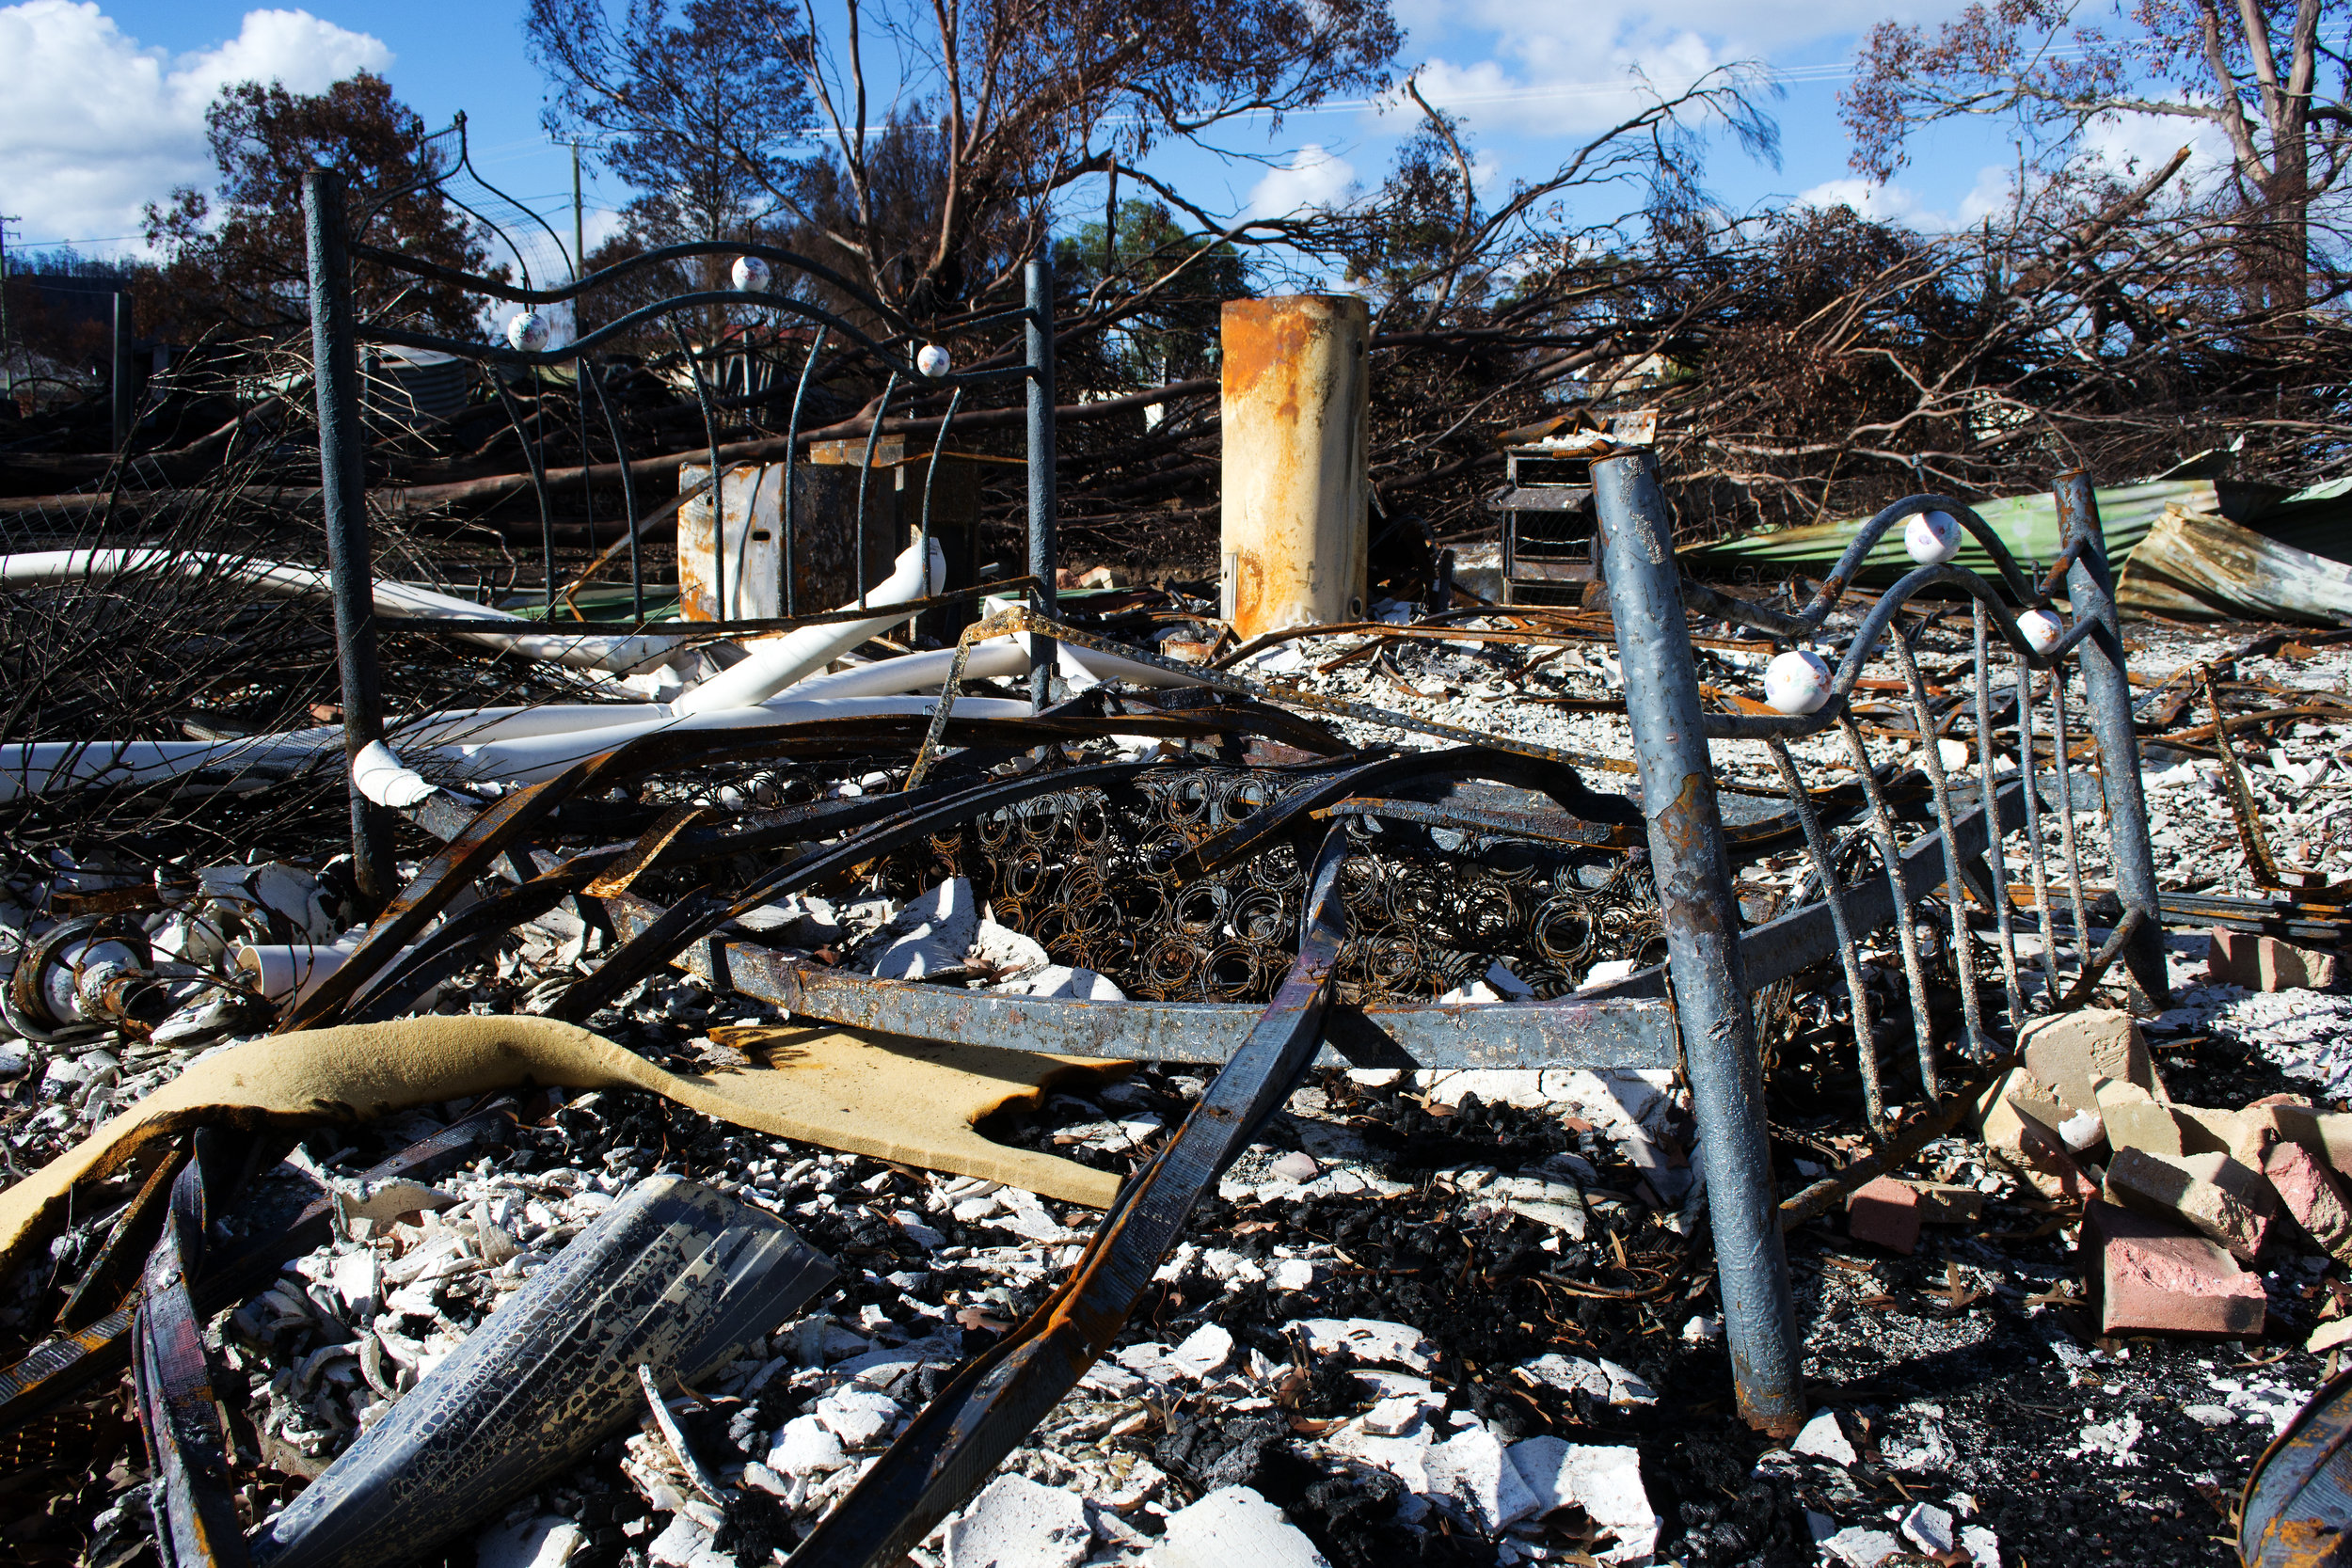 2013-02-28 - Tasmania - Dunalley after the fires - D3100  - DSC_0276-Edit.jpg